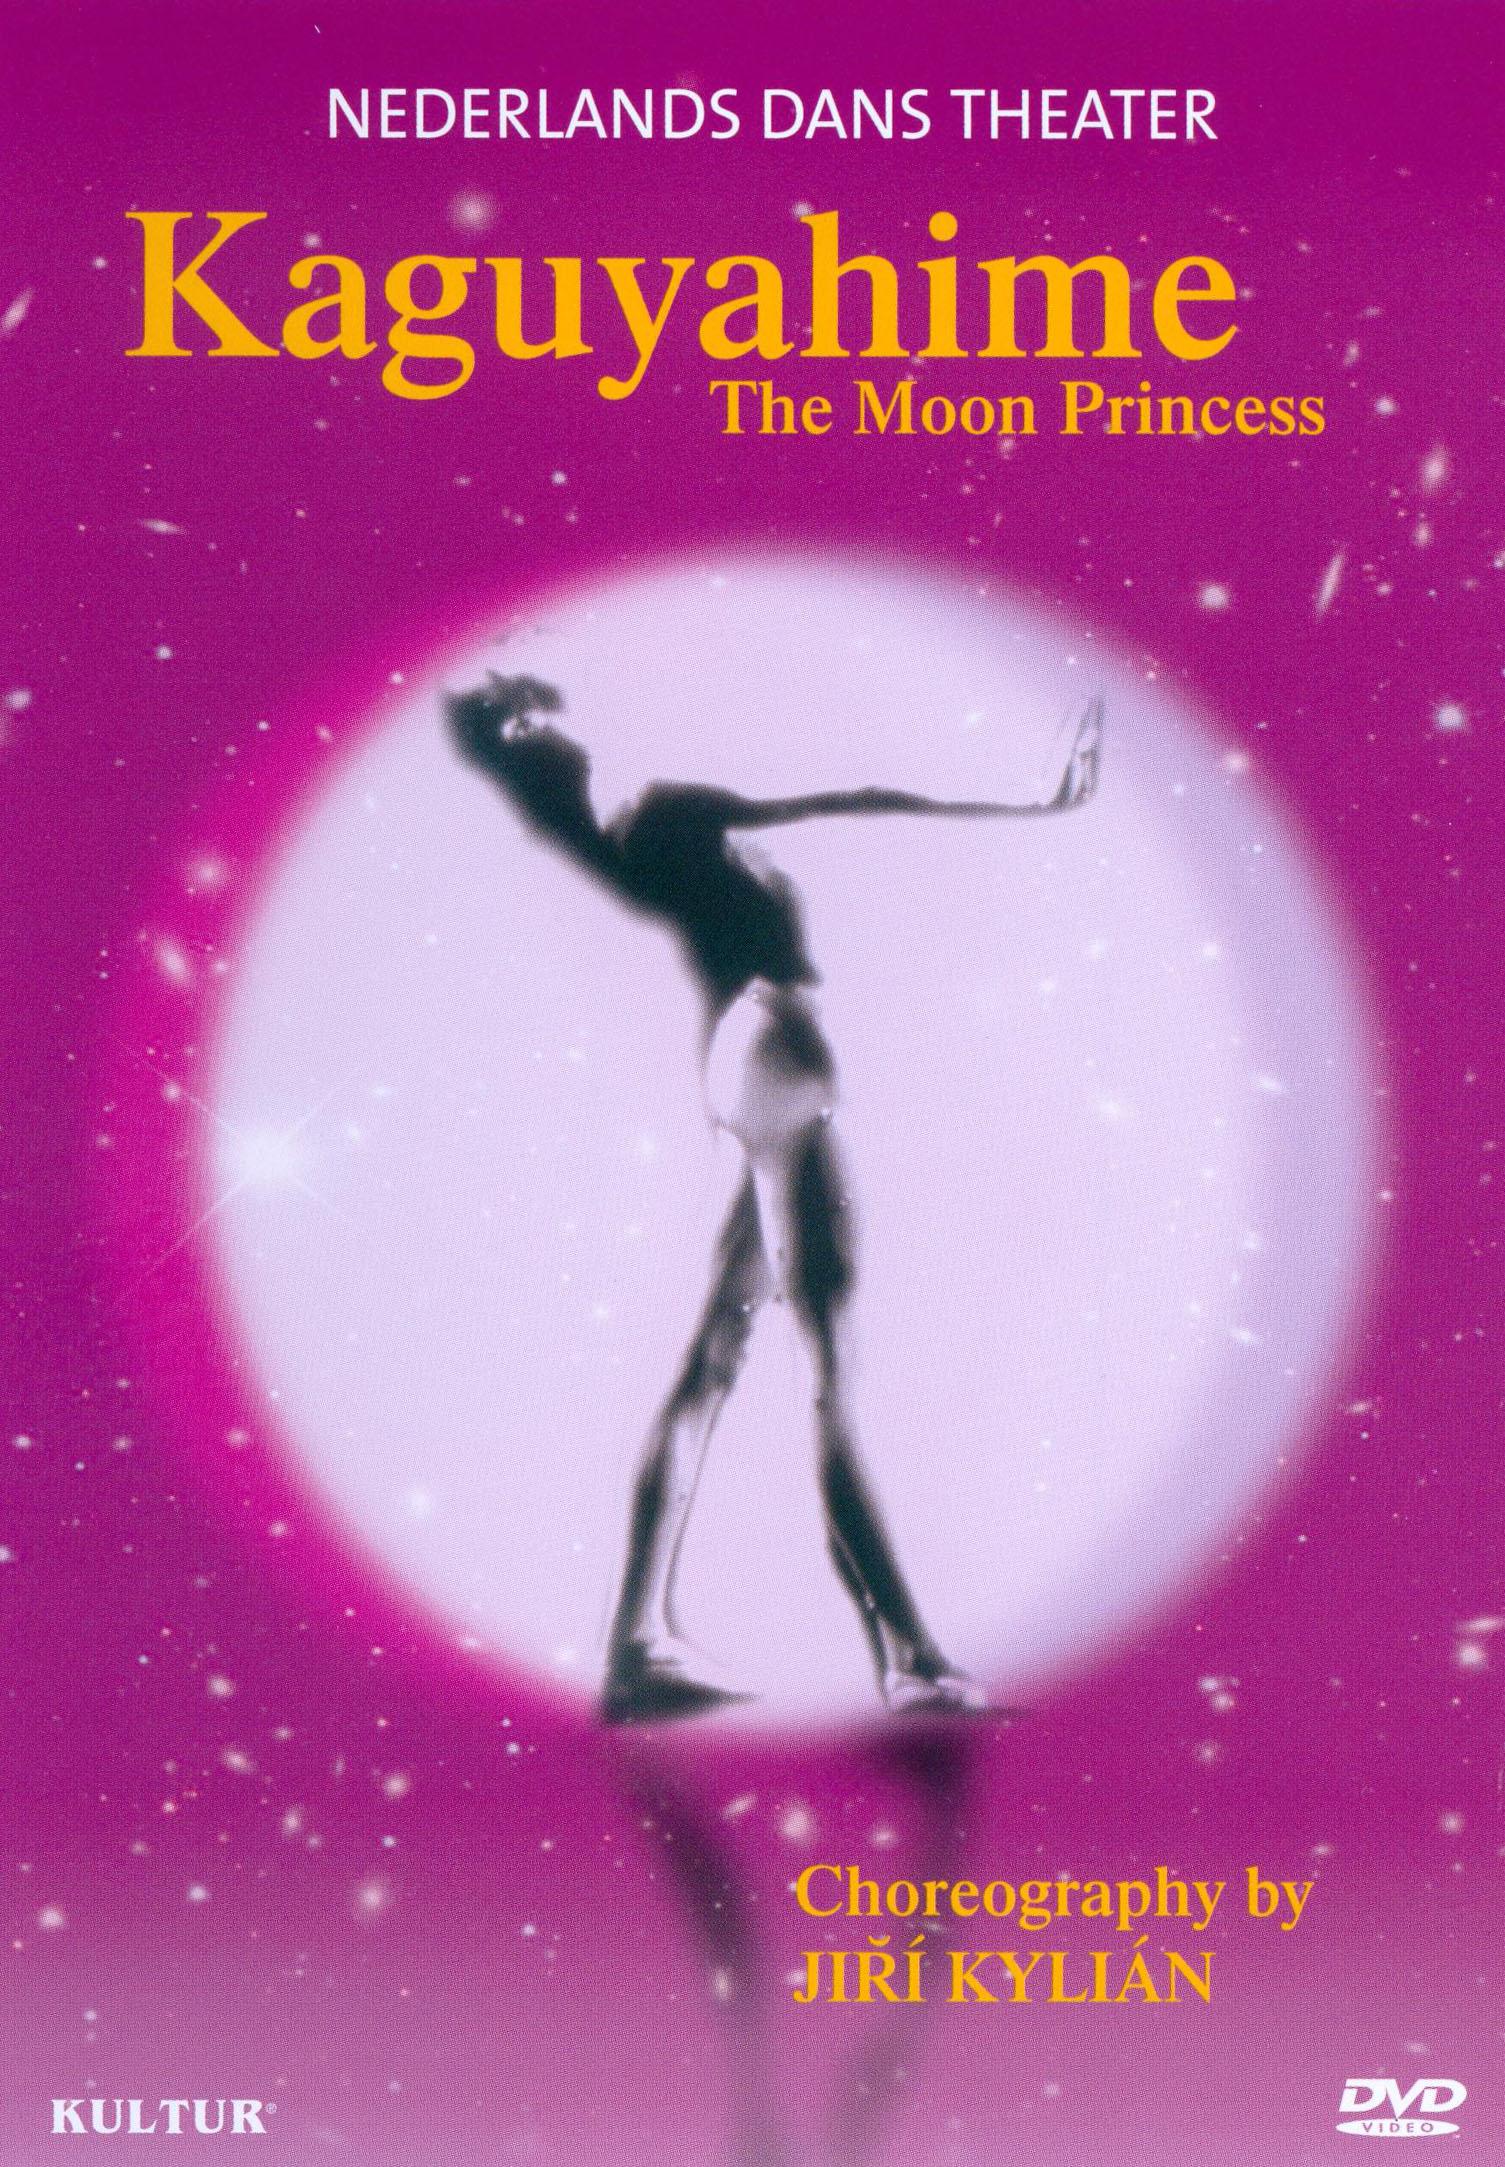 Kaguyahime: The Moon Princess (Nederlands Dans Theater)